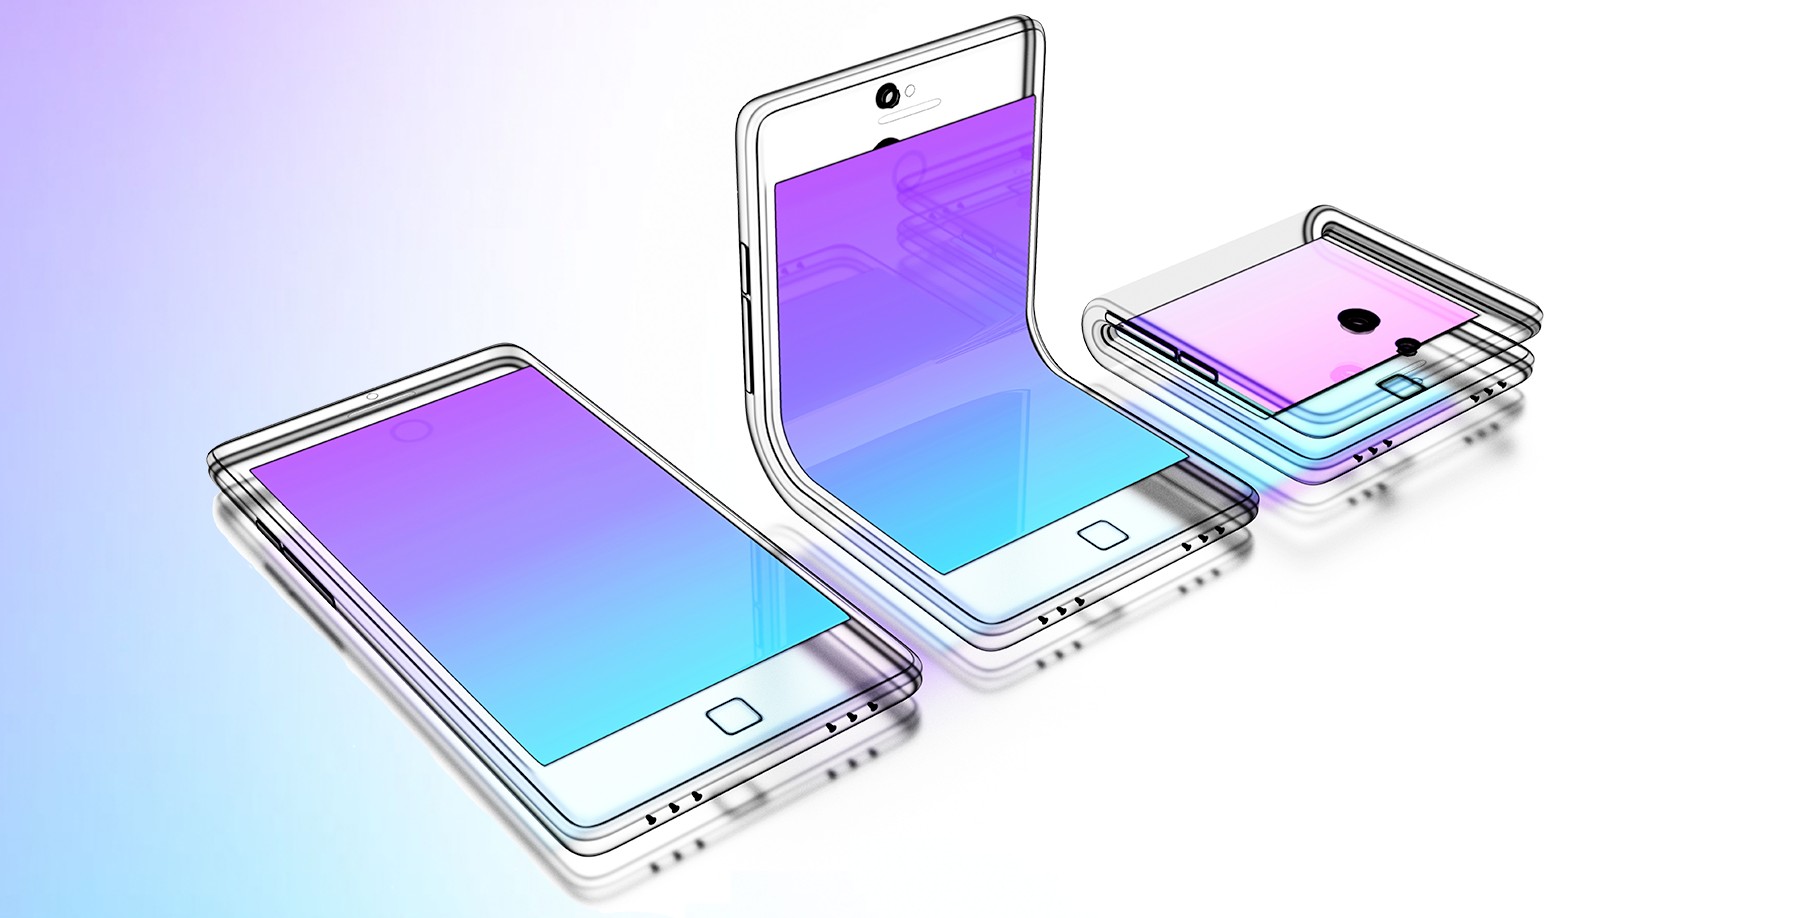 image-blog-perfecto-web-foldable-phones-recap-1